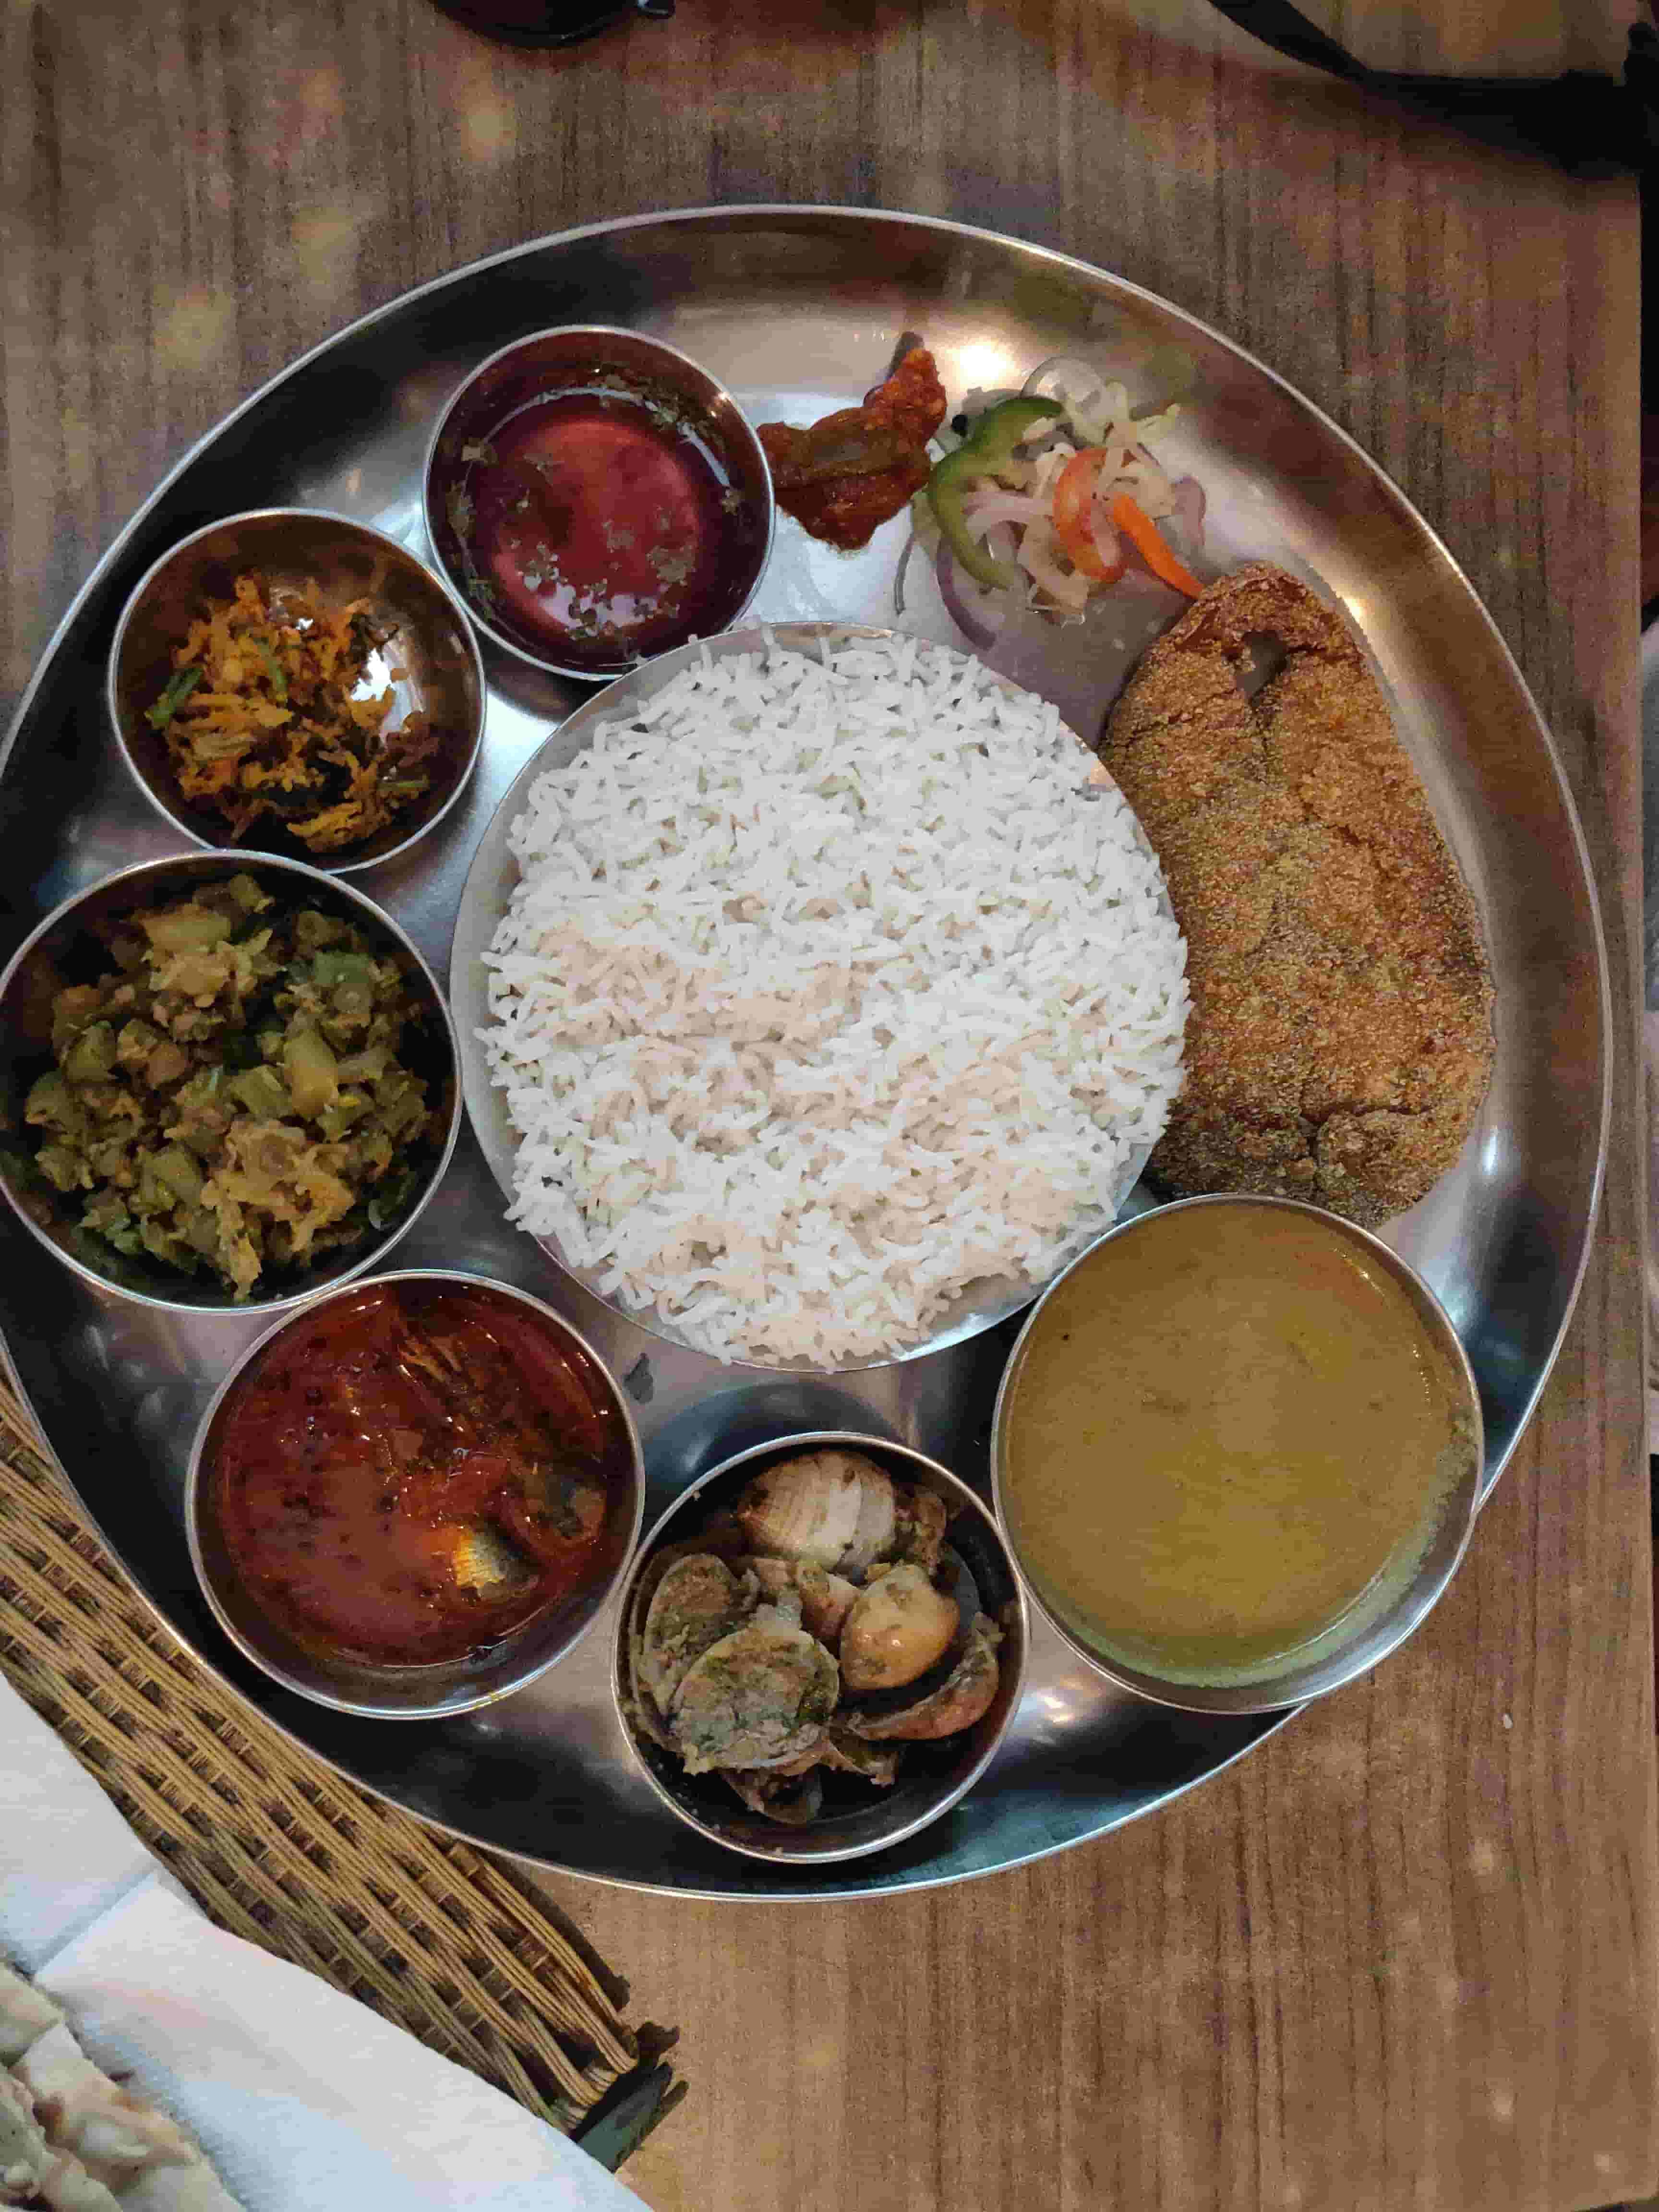 Things To Do In Goa in 2 Days Trip-Konkani canteen Thali- Goa Cuisine